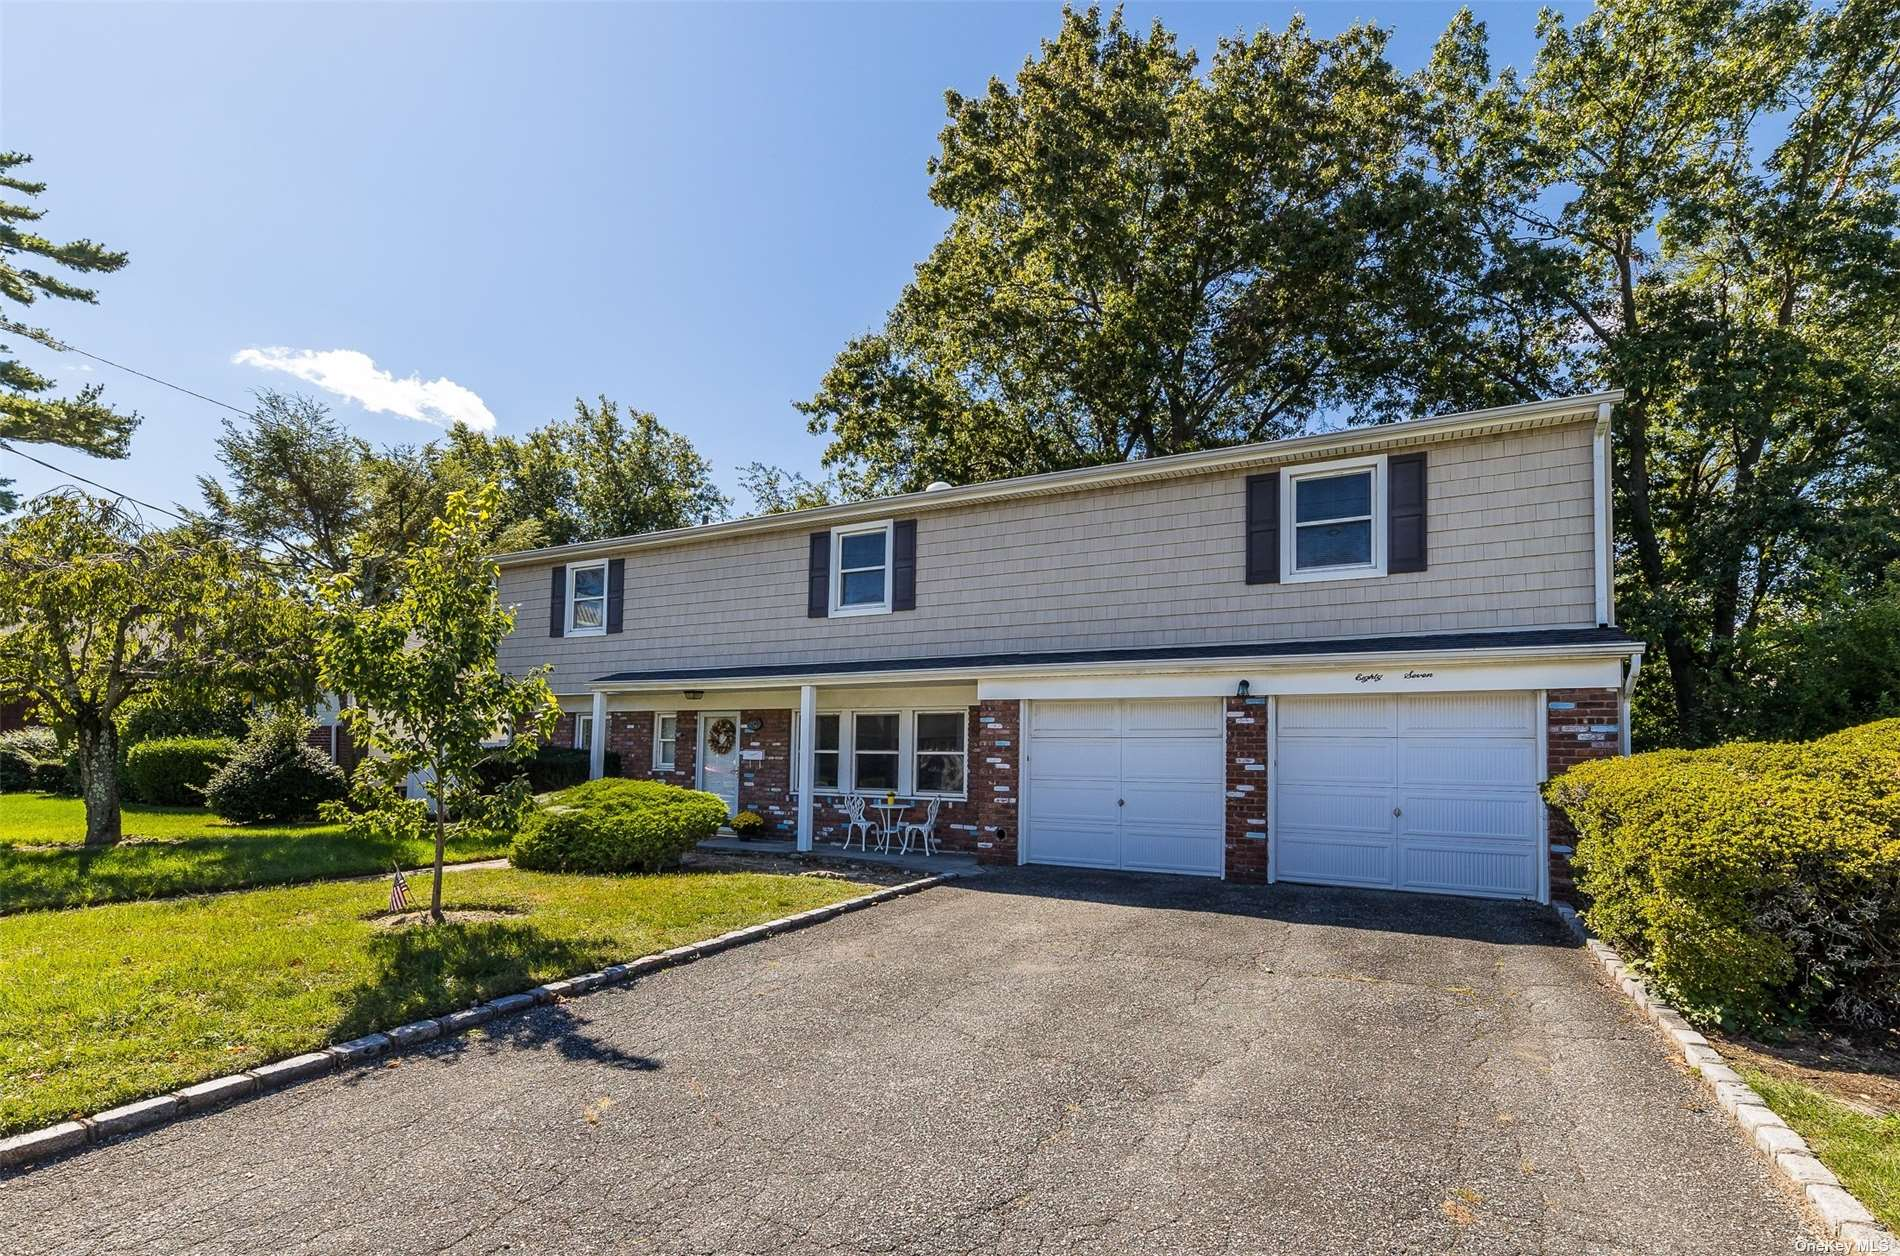 87 Hempstead Avenue, Malverne, New York11565 | Residential For Sale